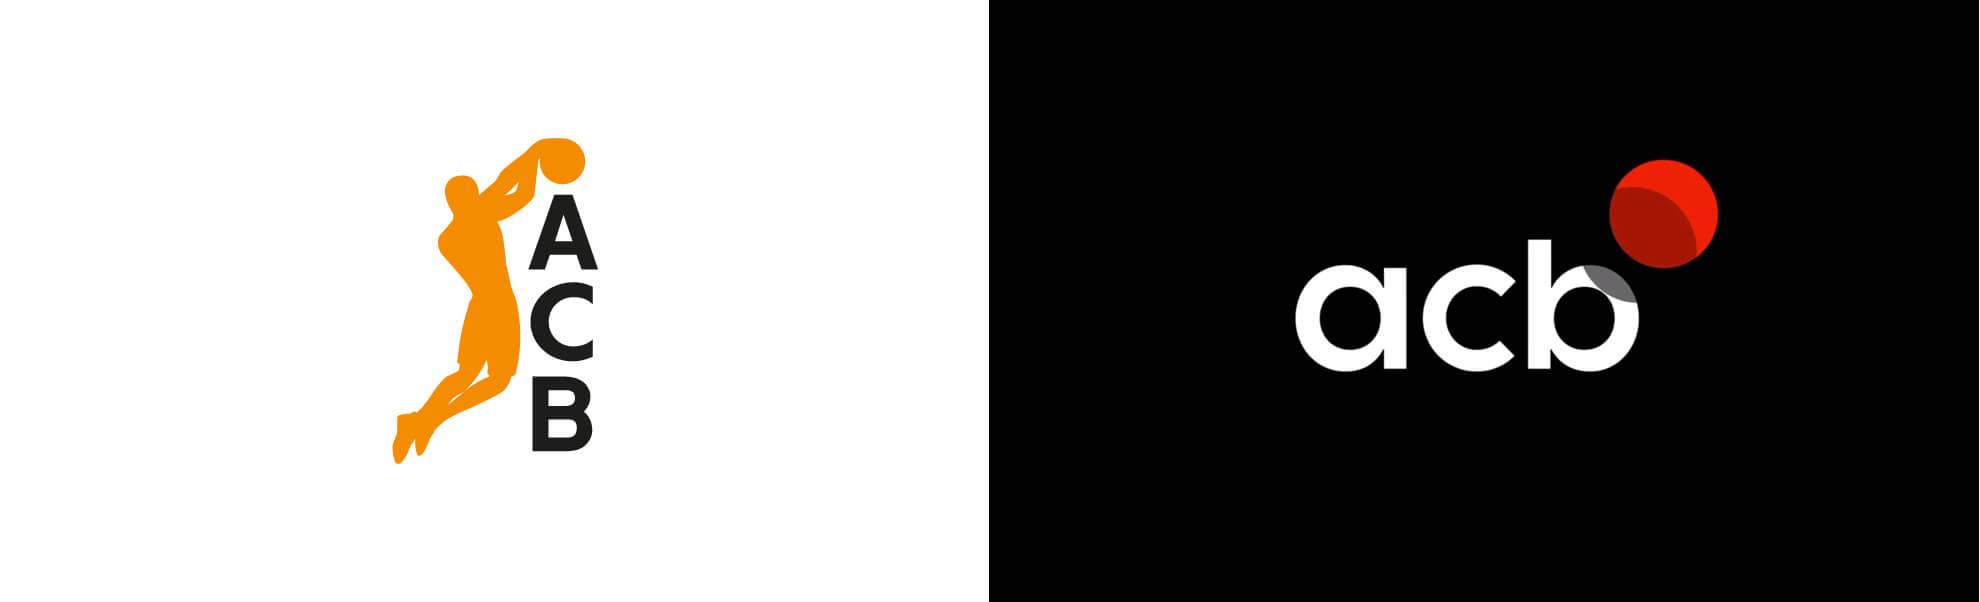 Hiszpańska liga acb zmienia logo